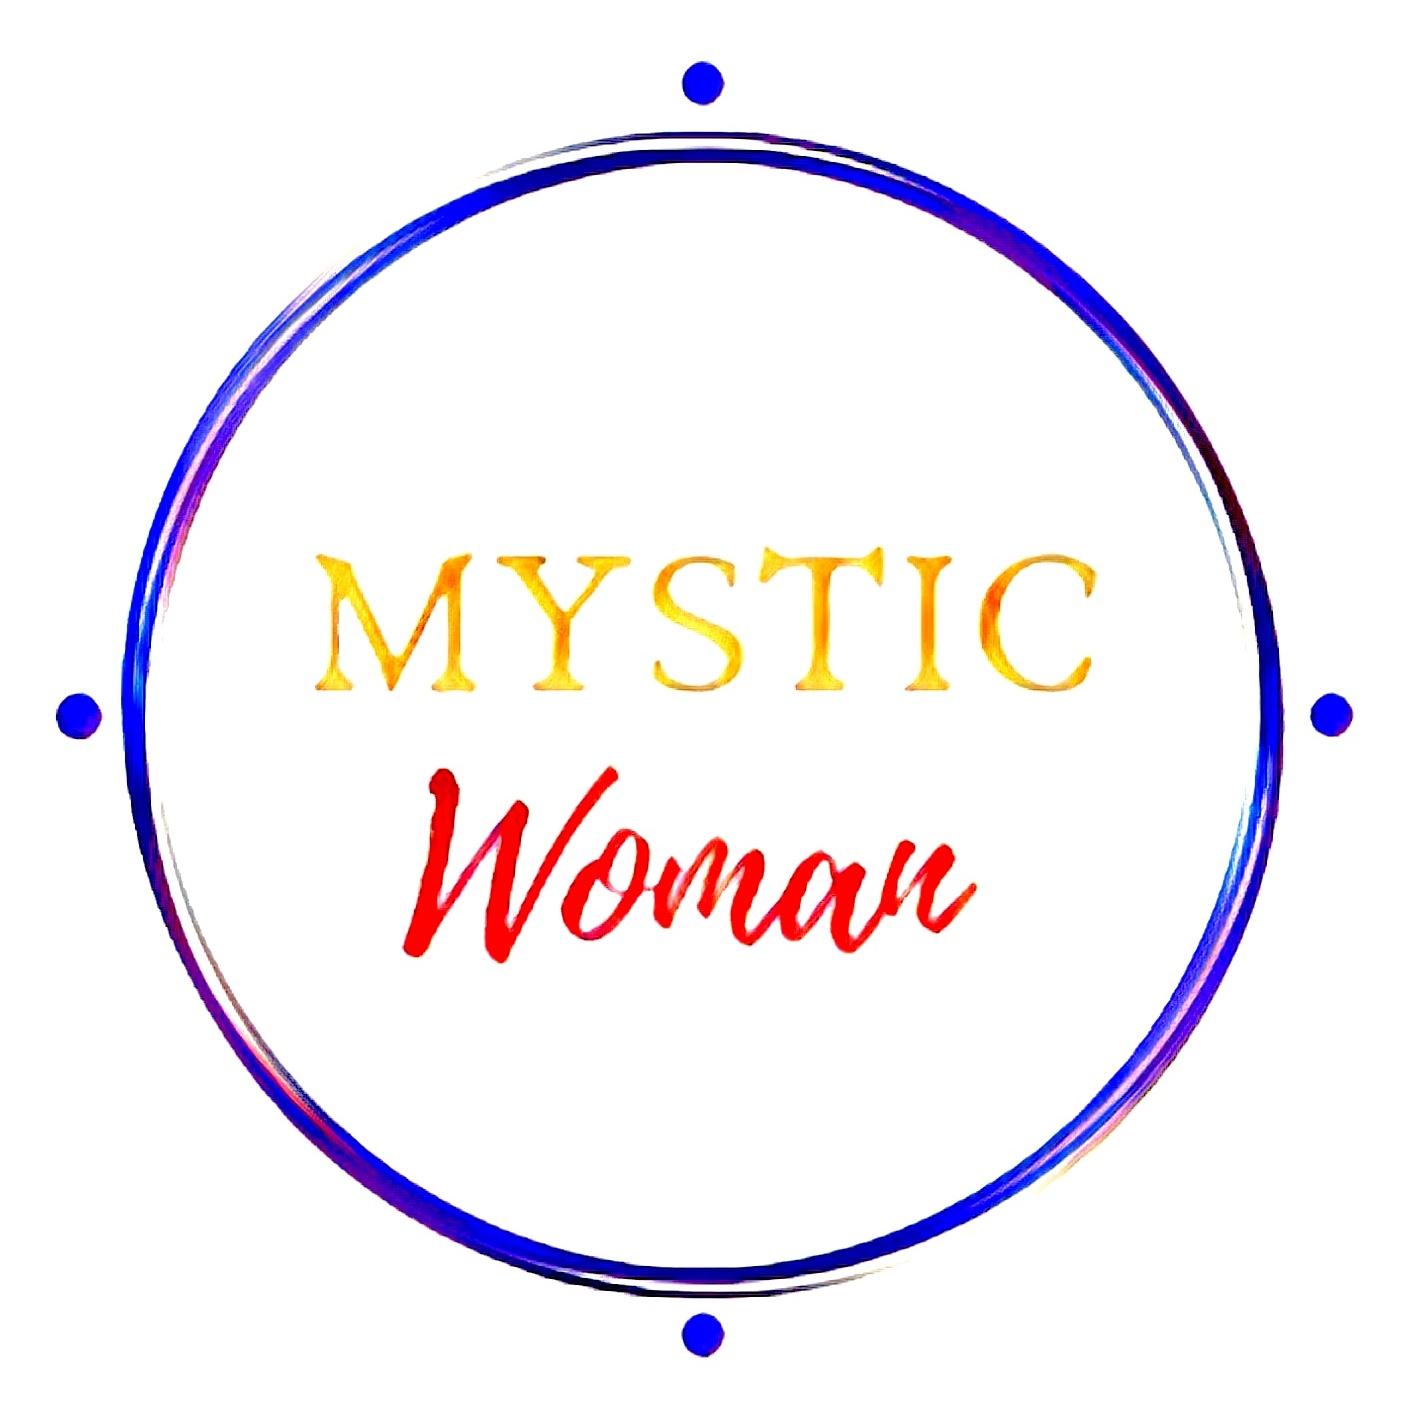 mysticwomanlogo.jpg